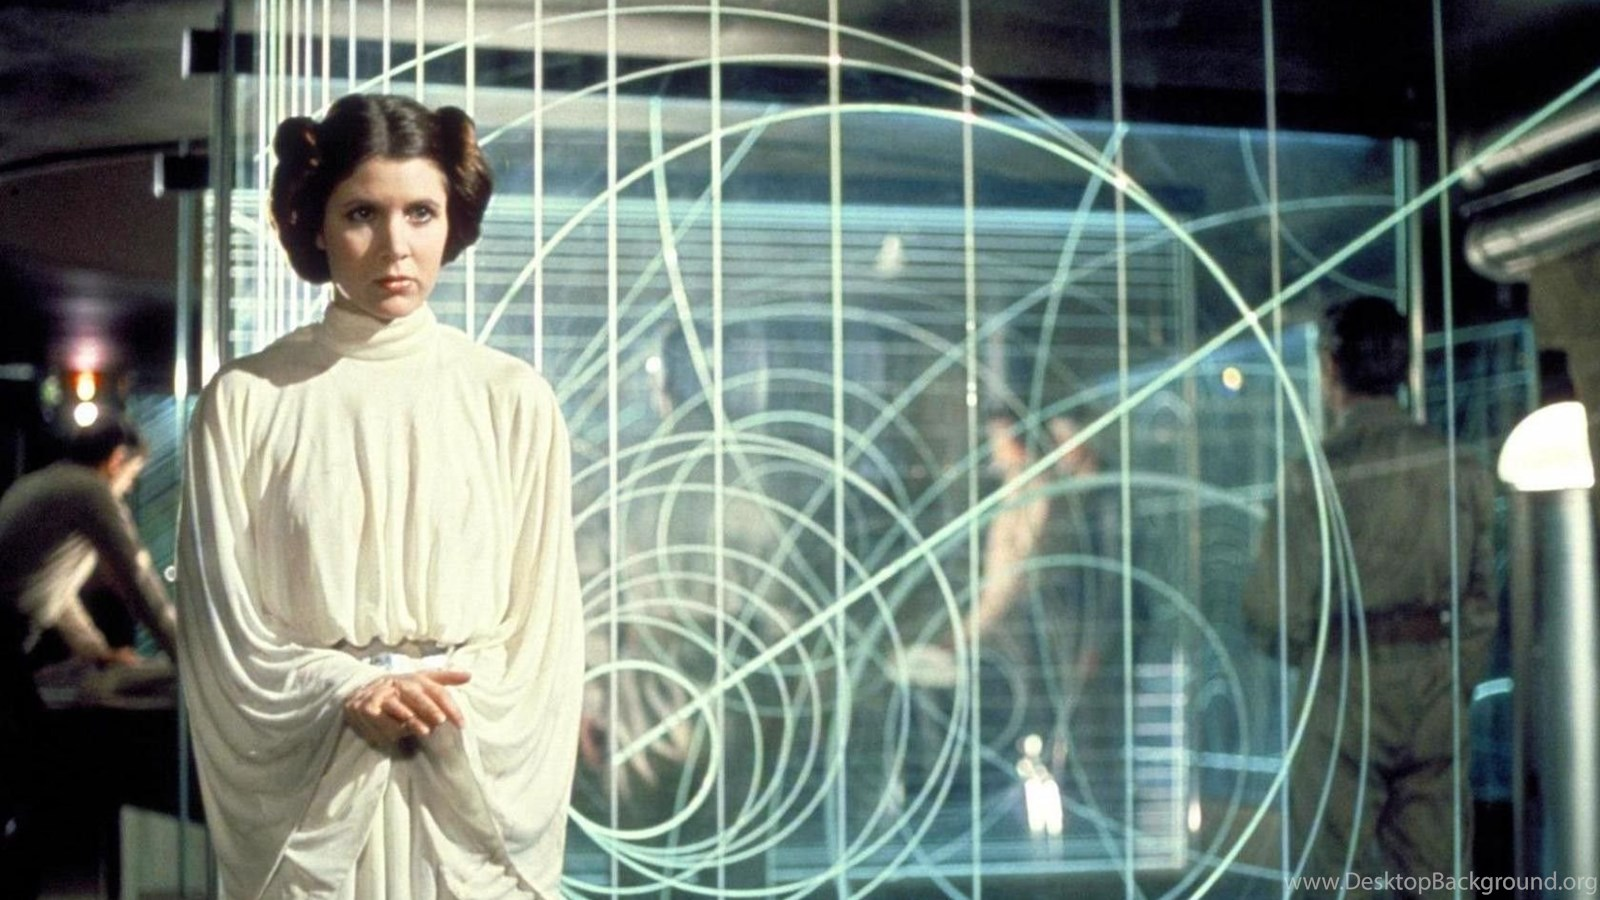 Star Wars Carrie Fisher Princess Leia Leia Organa Wallpapers Hd Desktop Background